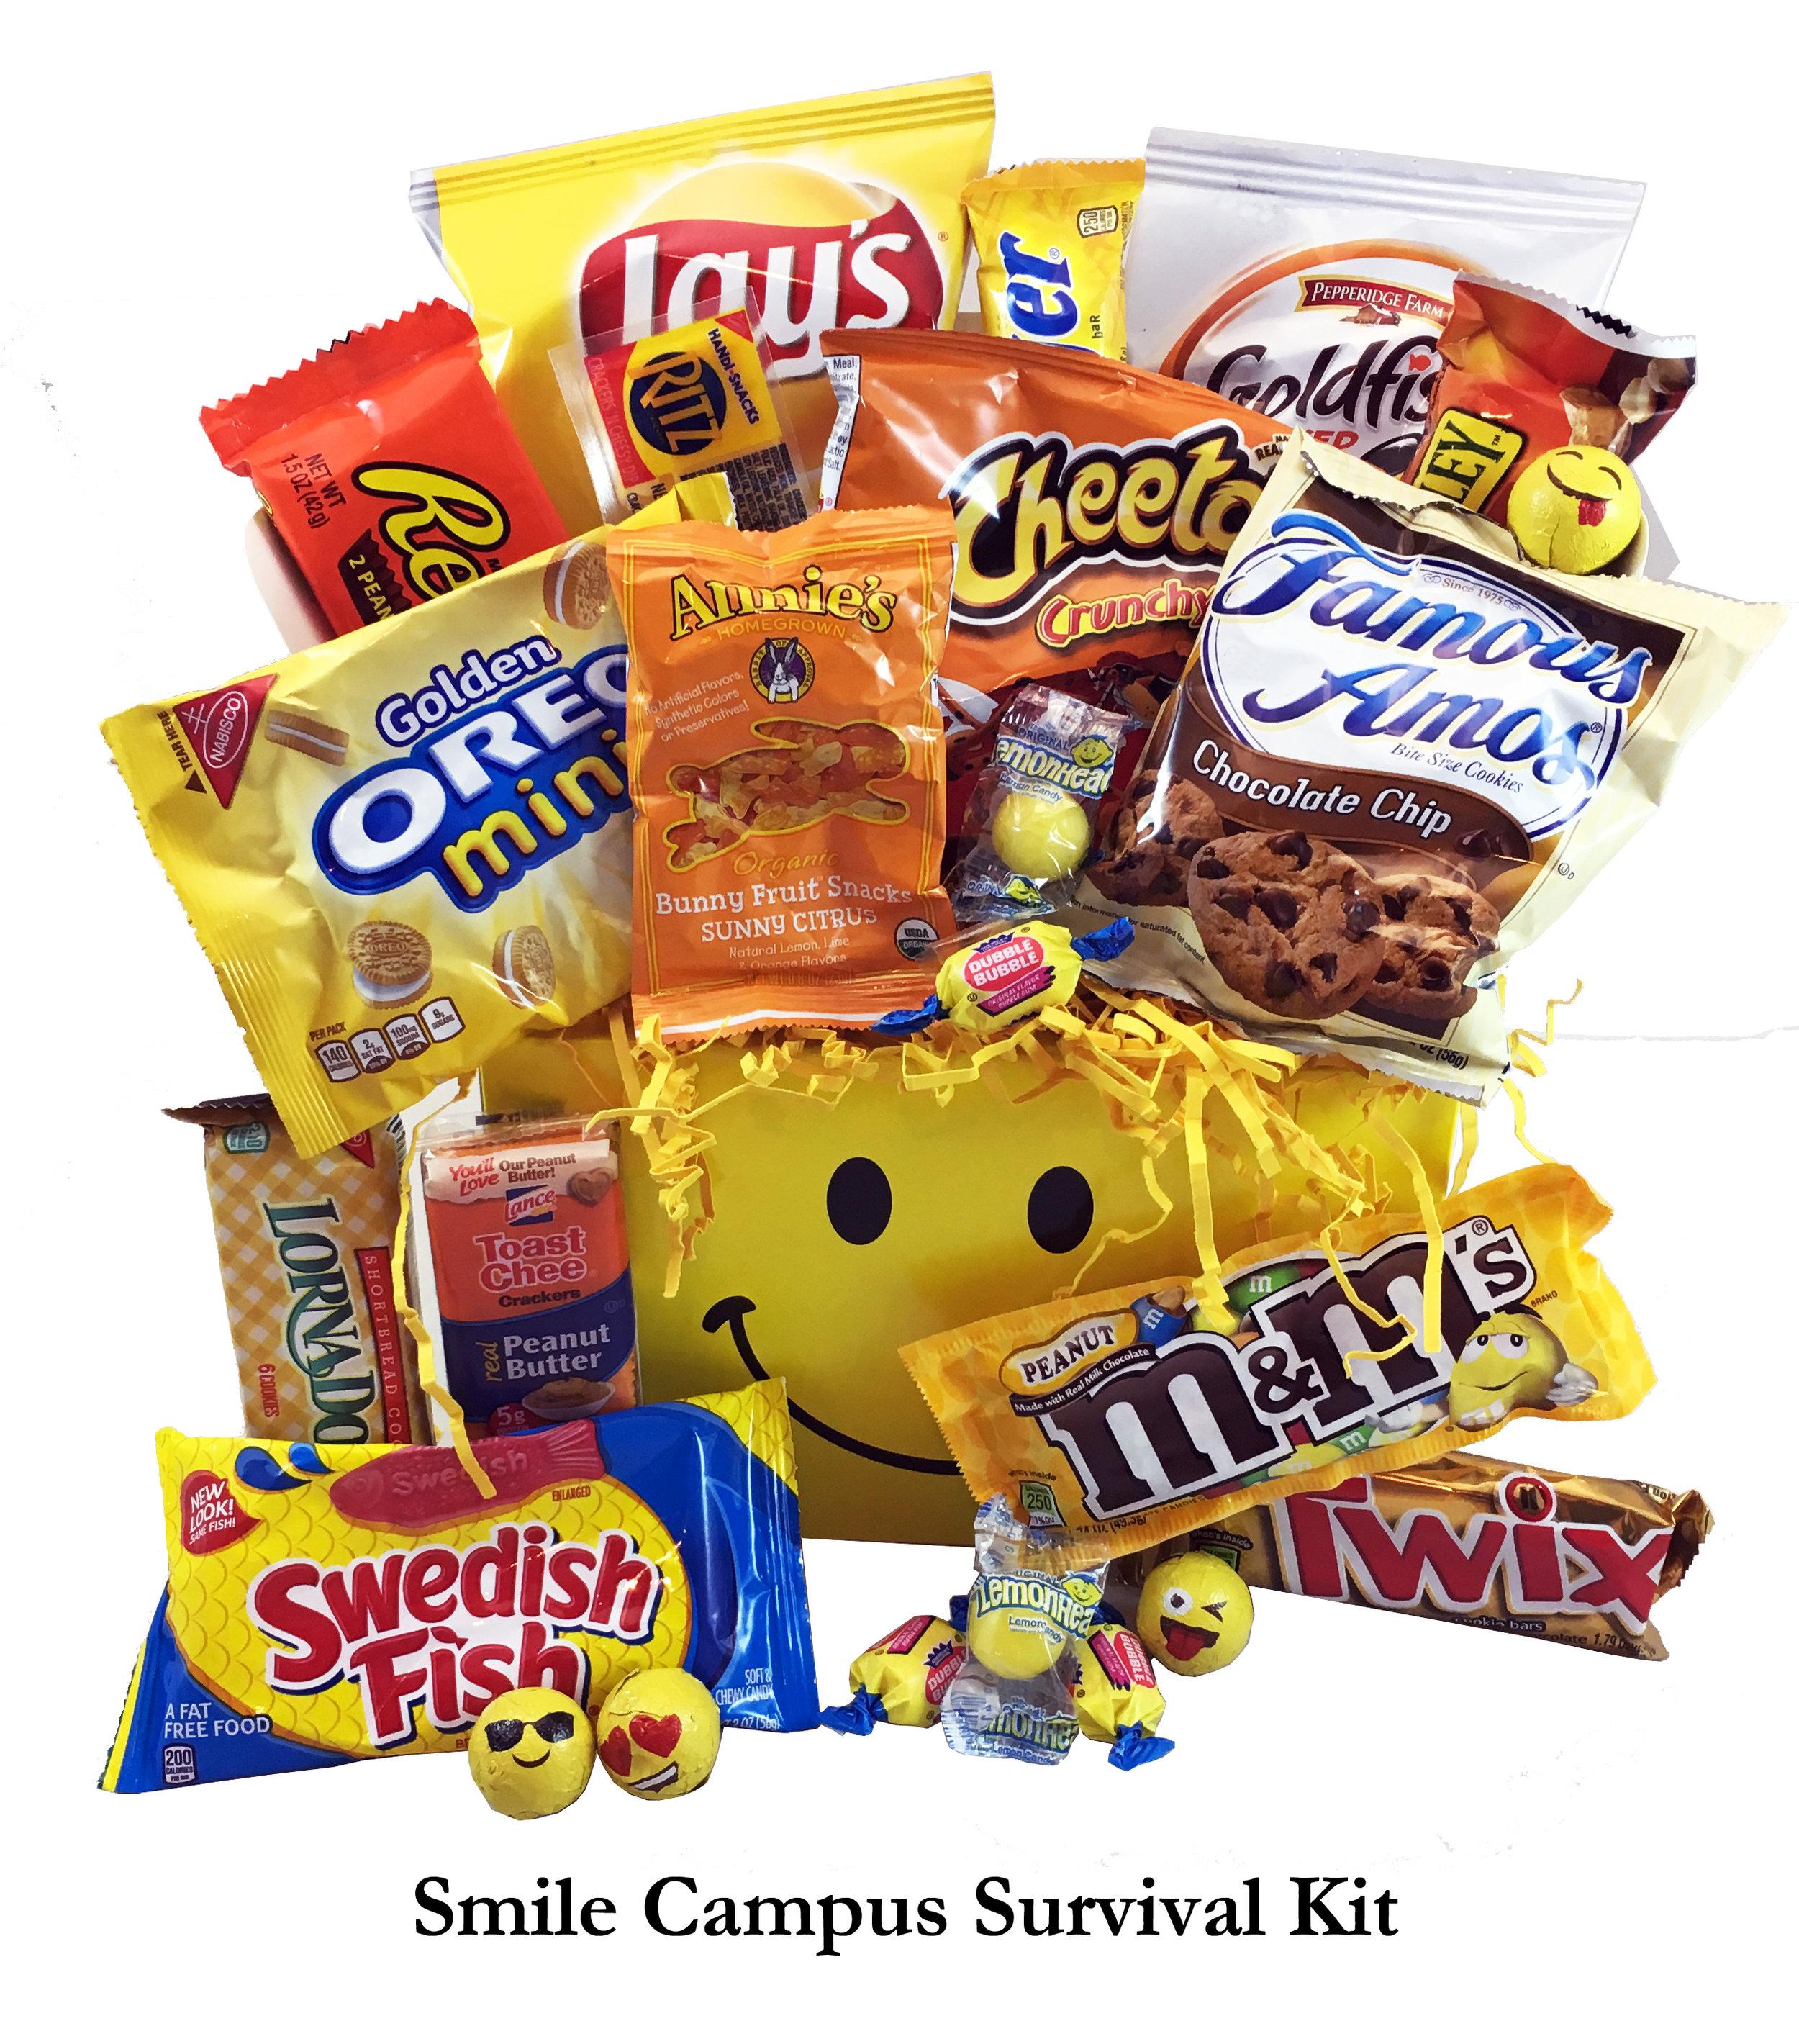 Smile Campus Survival Kit